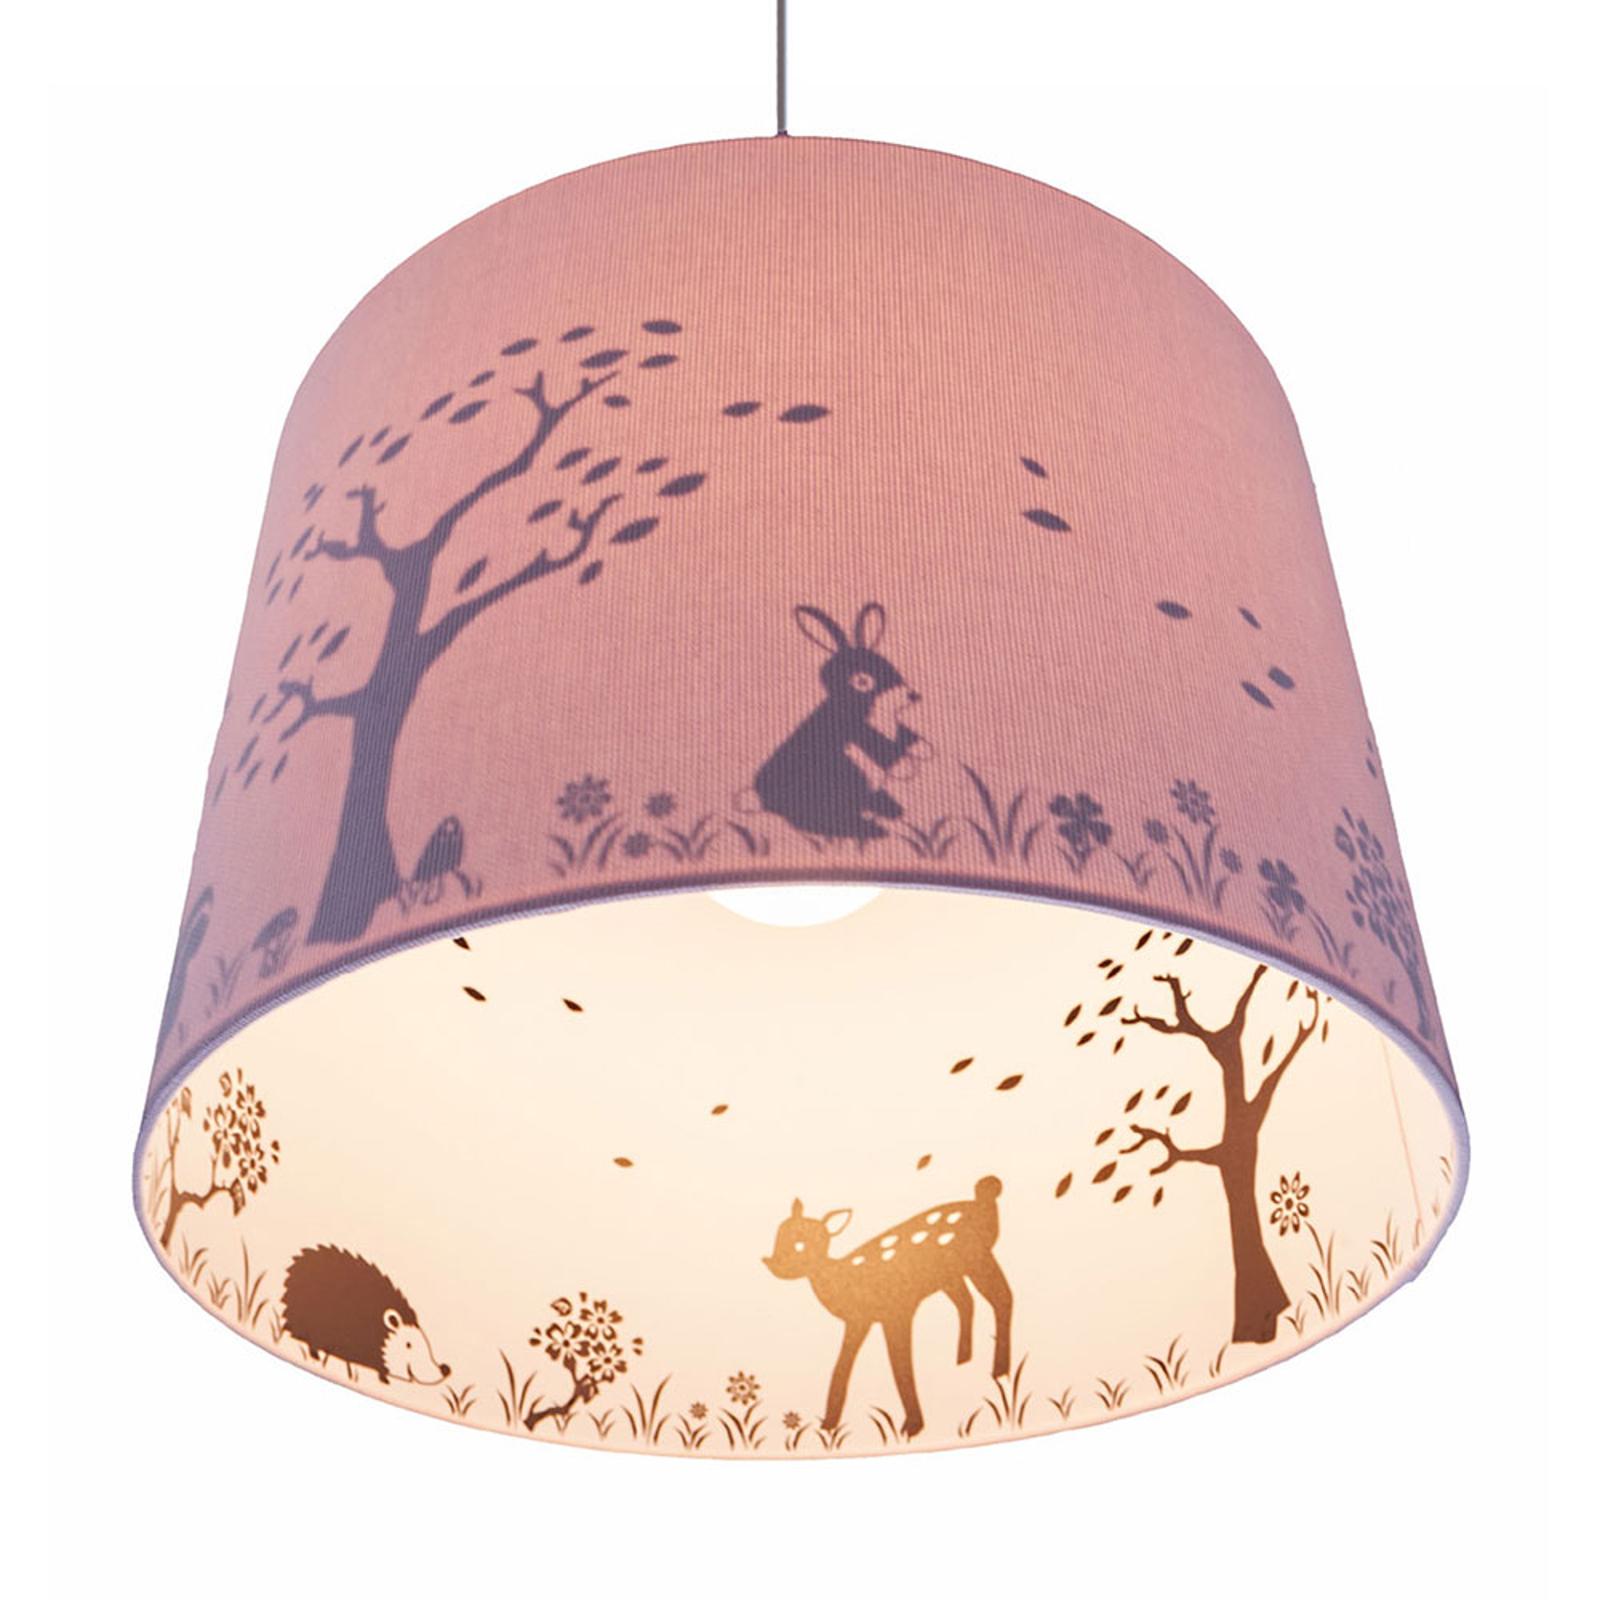 Binnenin bedrukte hanglamp Carla, motief hert